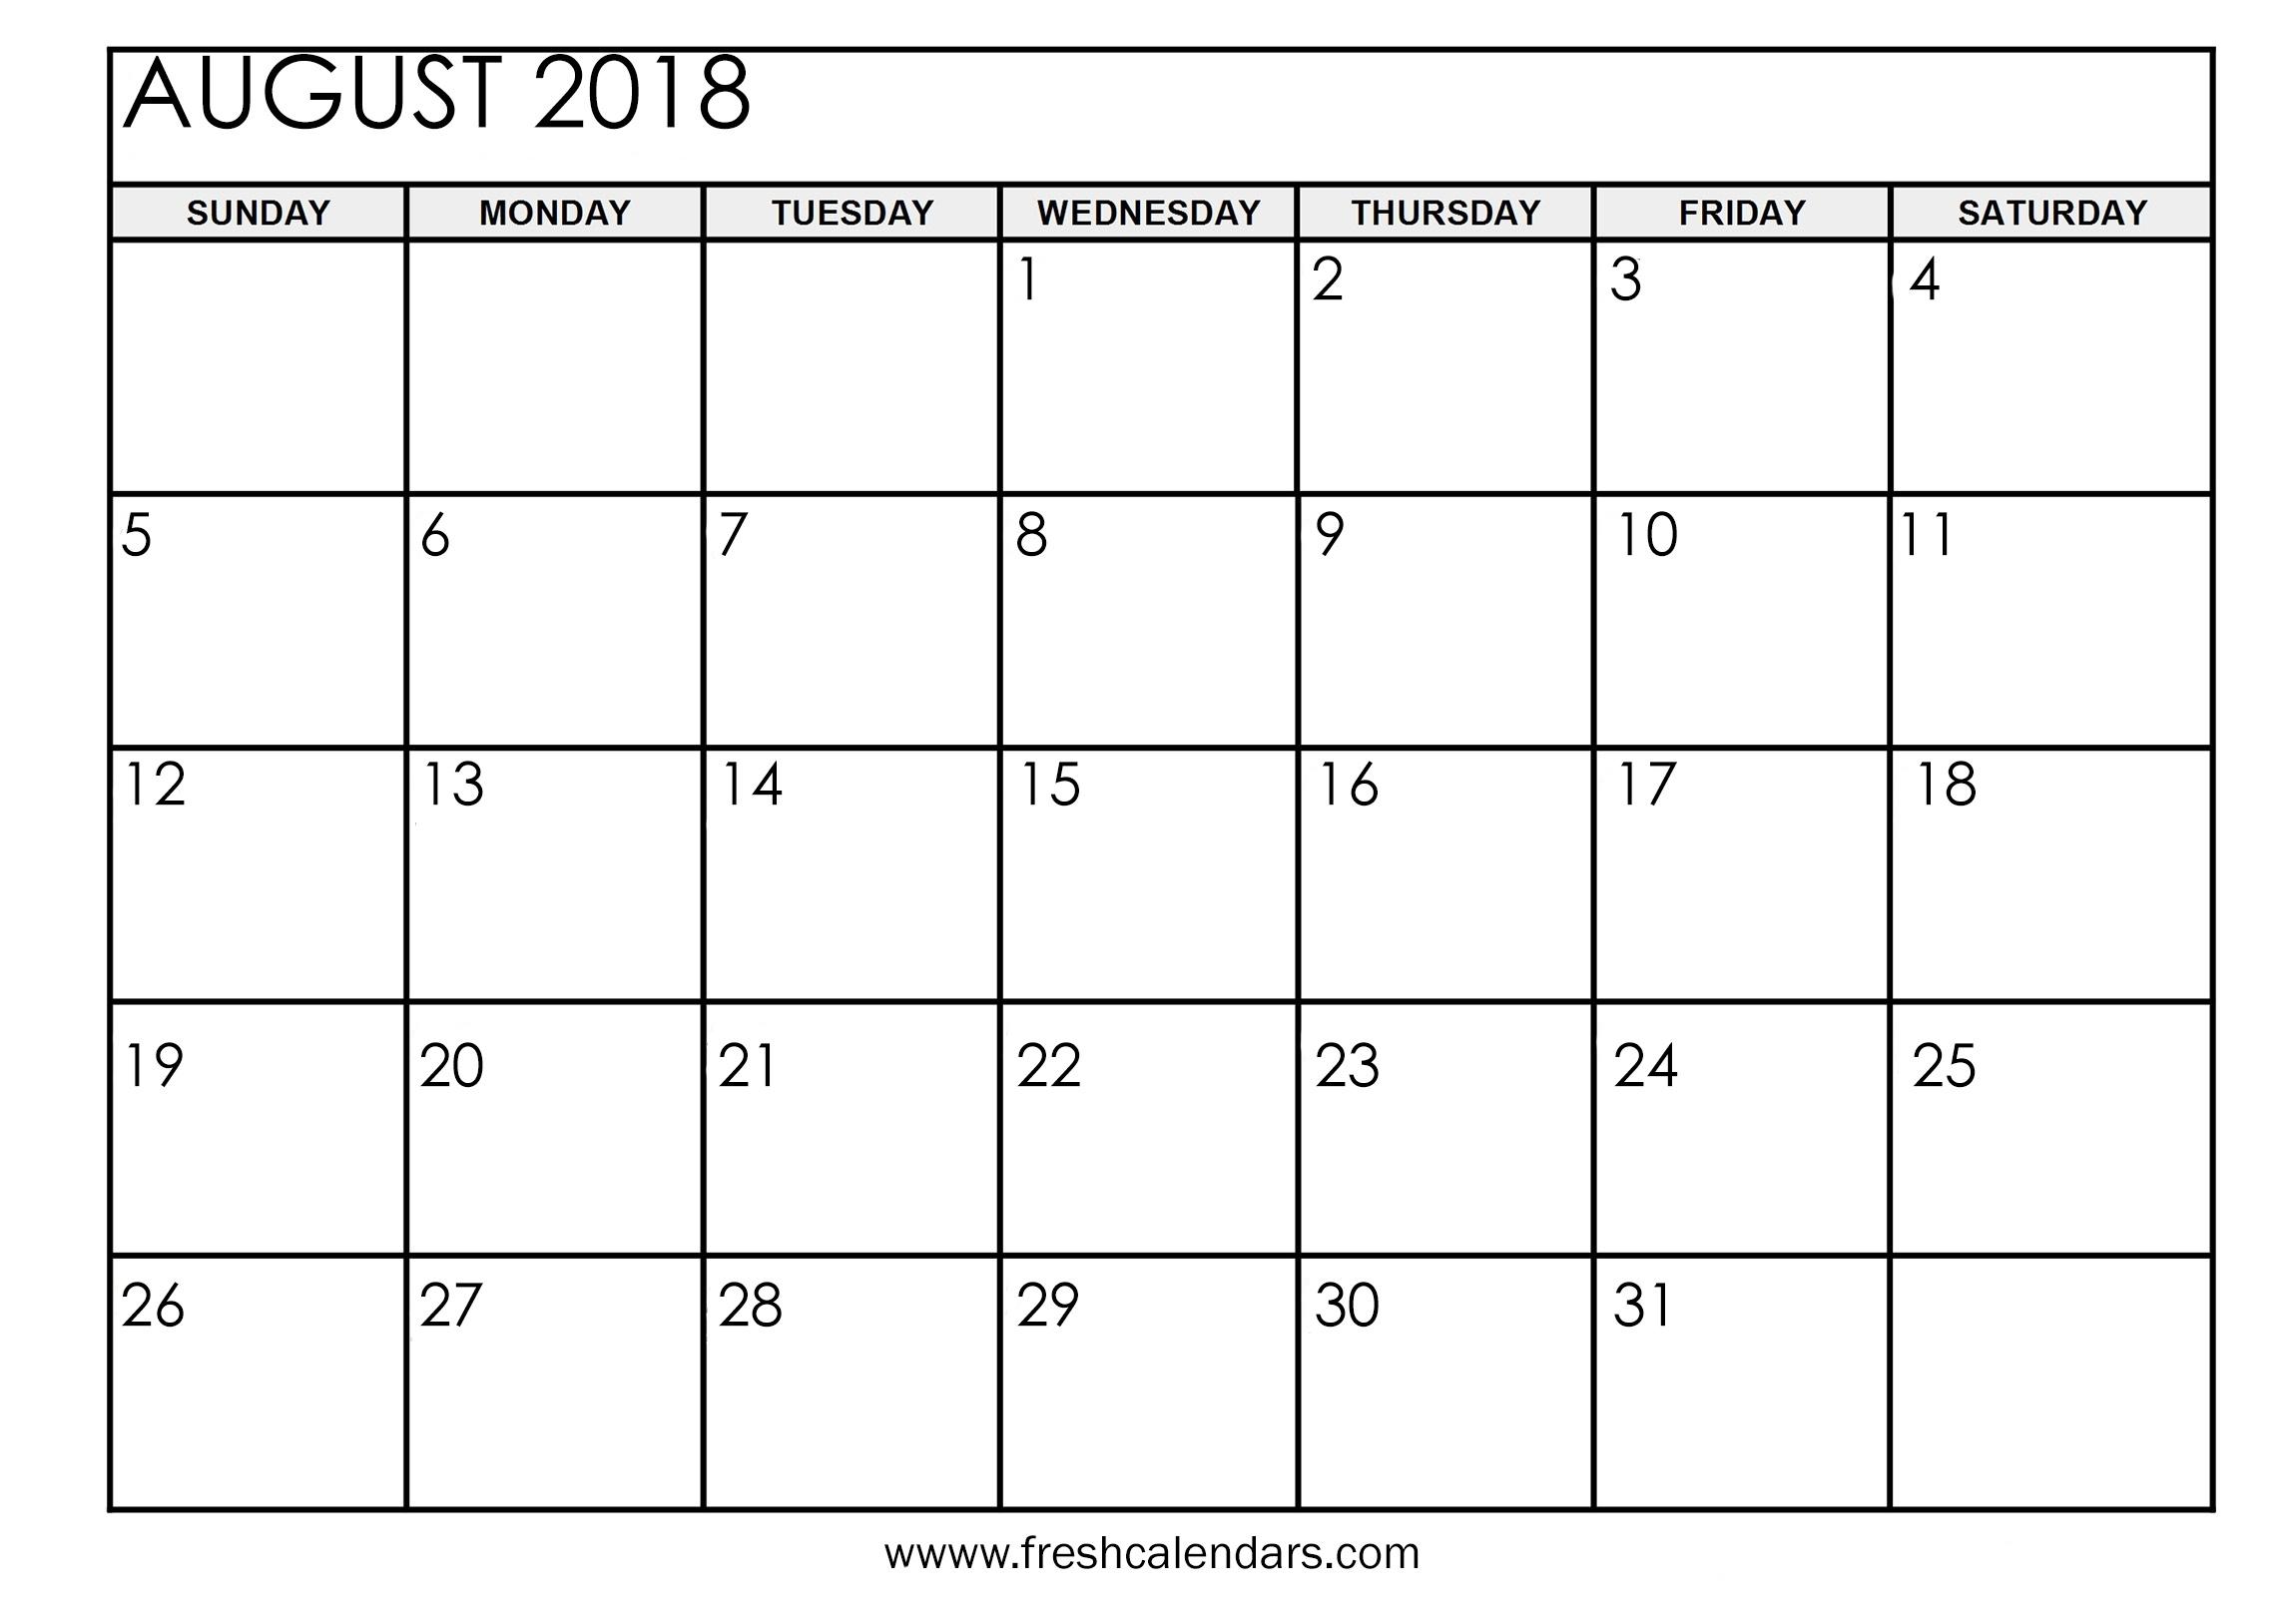 Aug 2018 Calendar Printable – Template Calendar Design